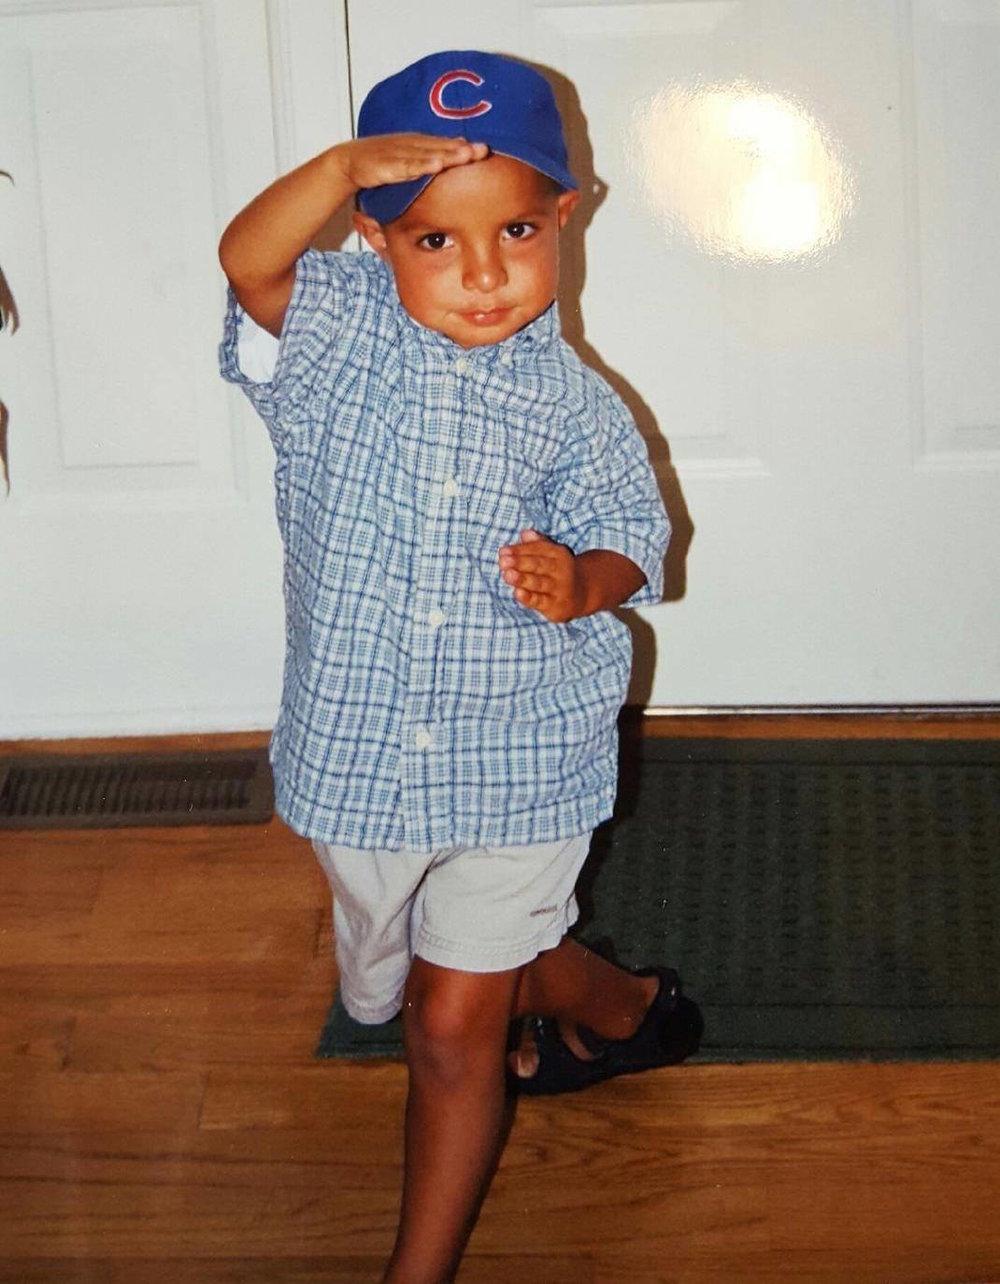 nick kiddo 2.jpg